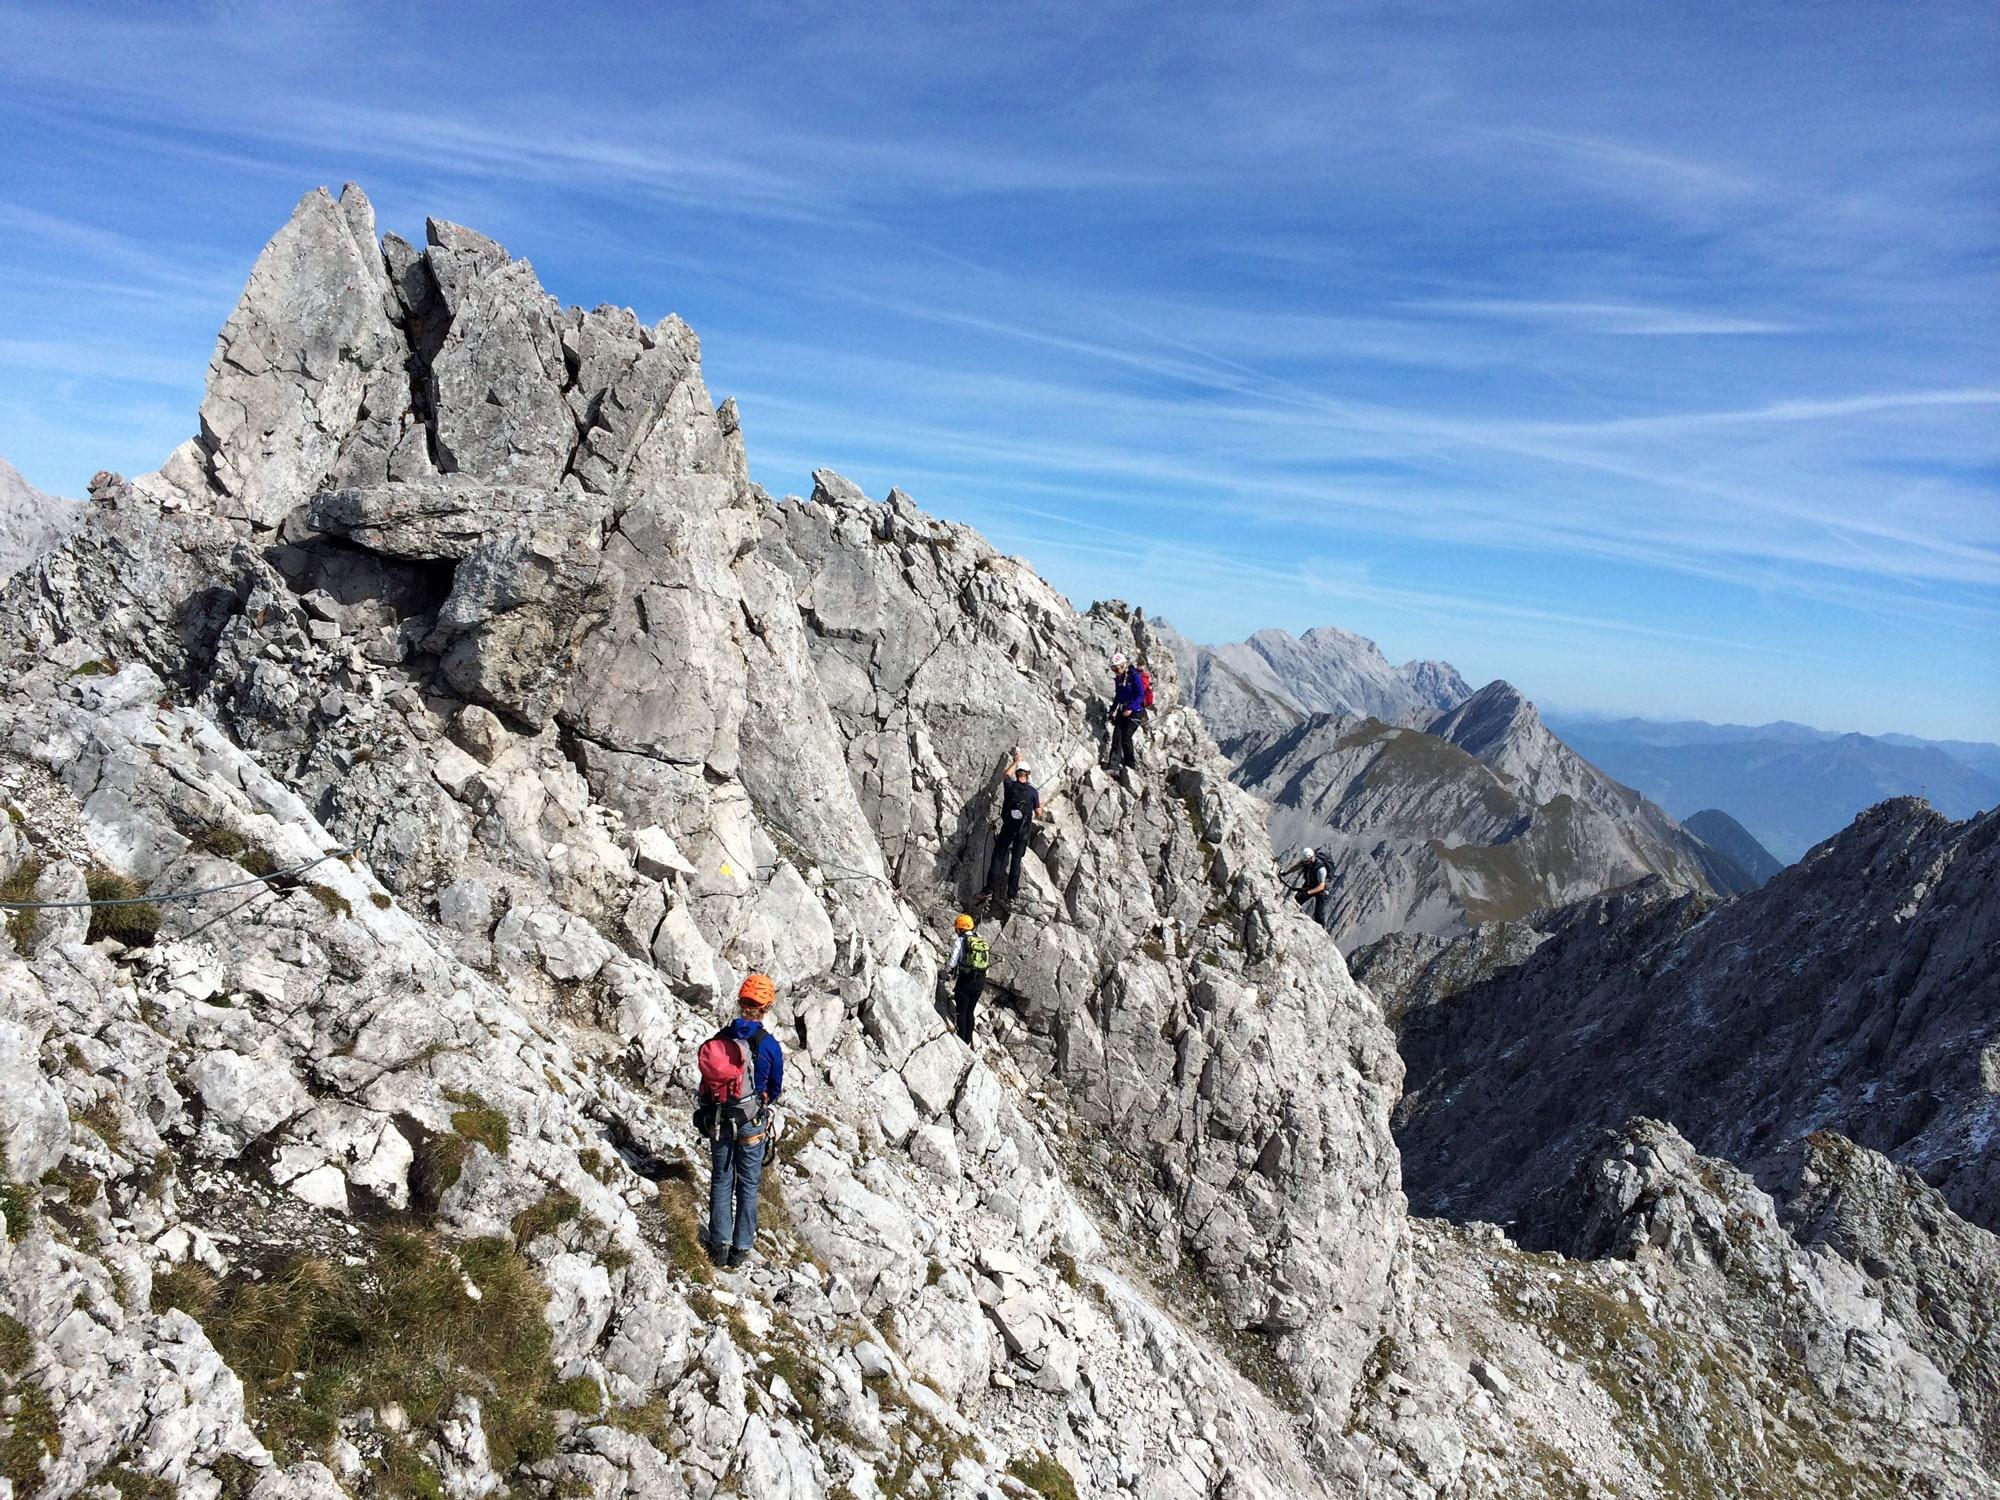 Klettersteig Innsbruck Nordkette : Check der innsbrucker klettersteig c d bergwelten